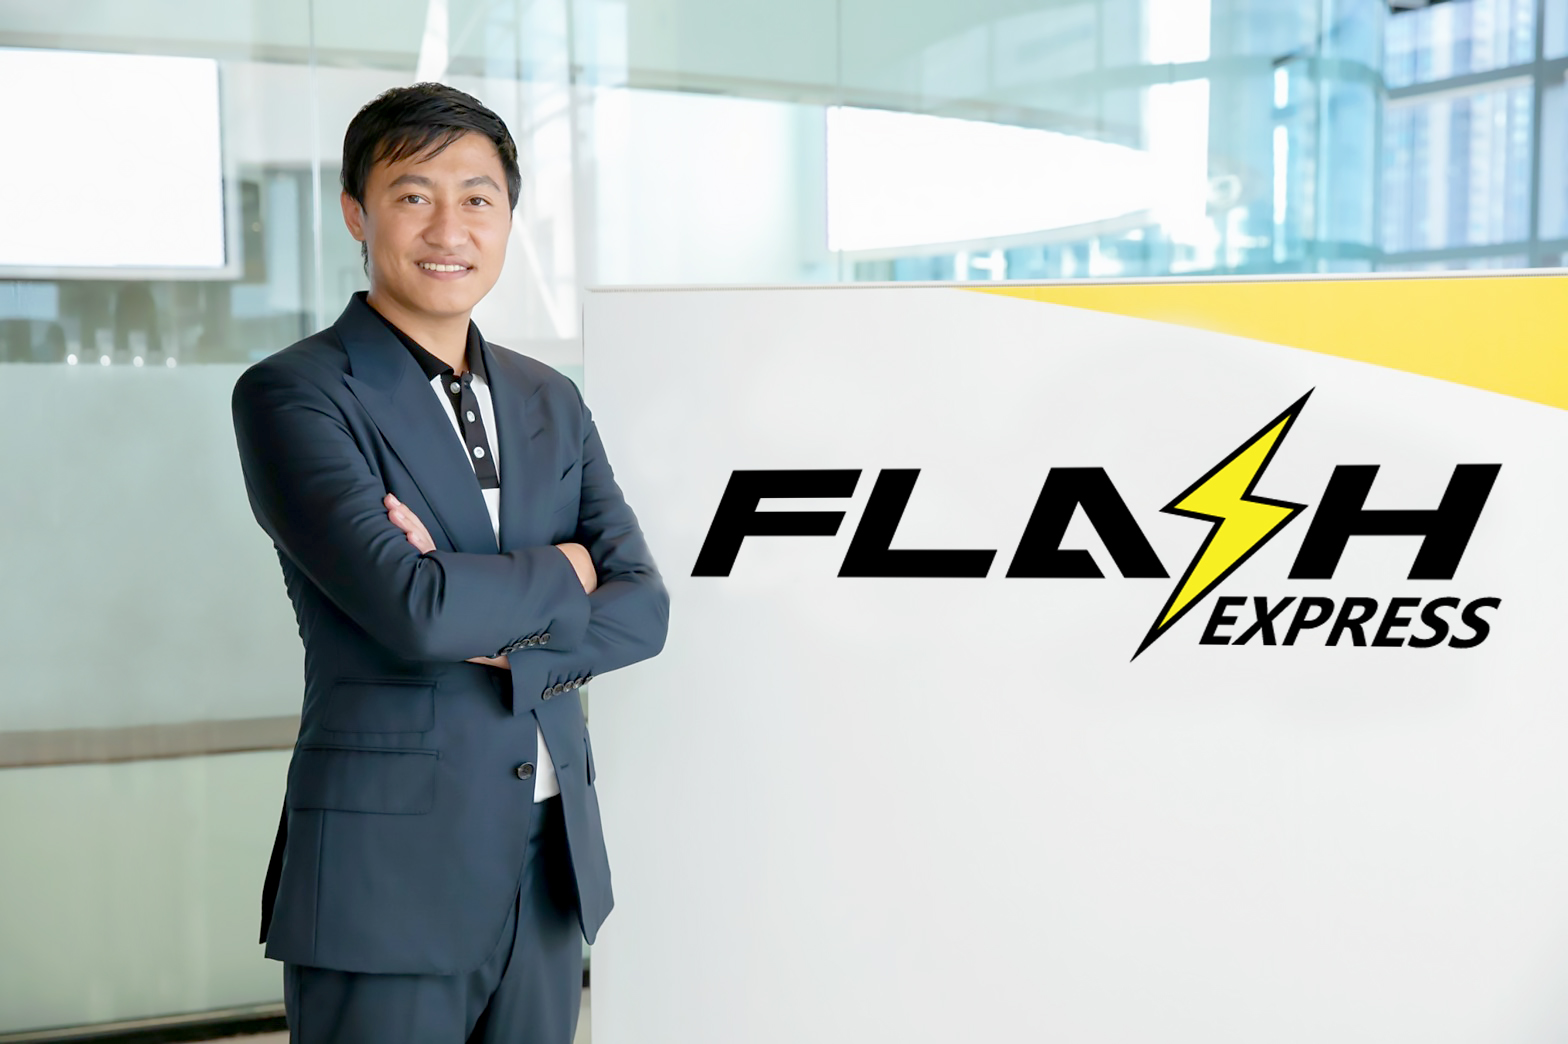 Thai Logistics Unicorn Flash Express Enters Laos Via Partnership With AIF Group